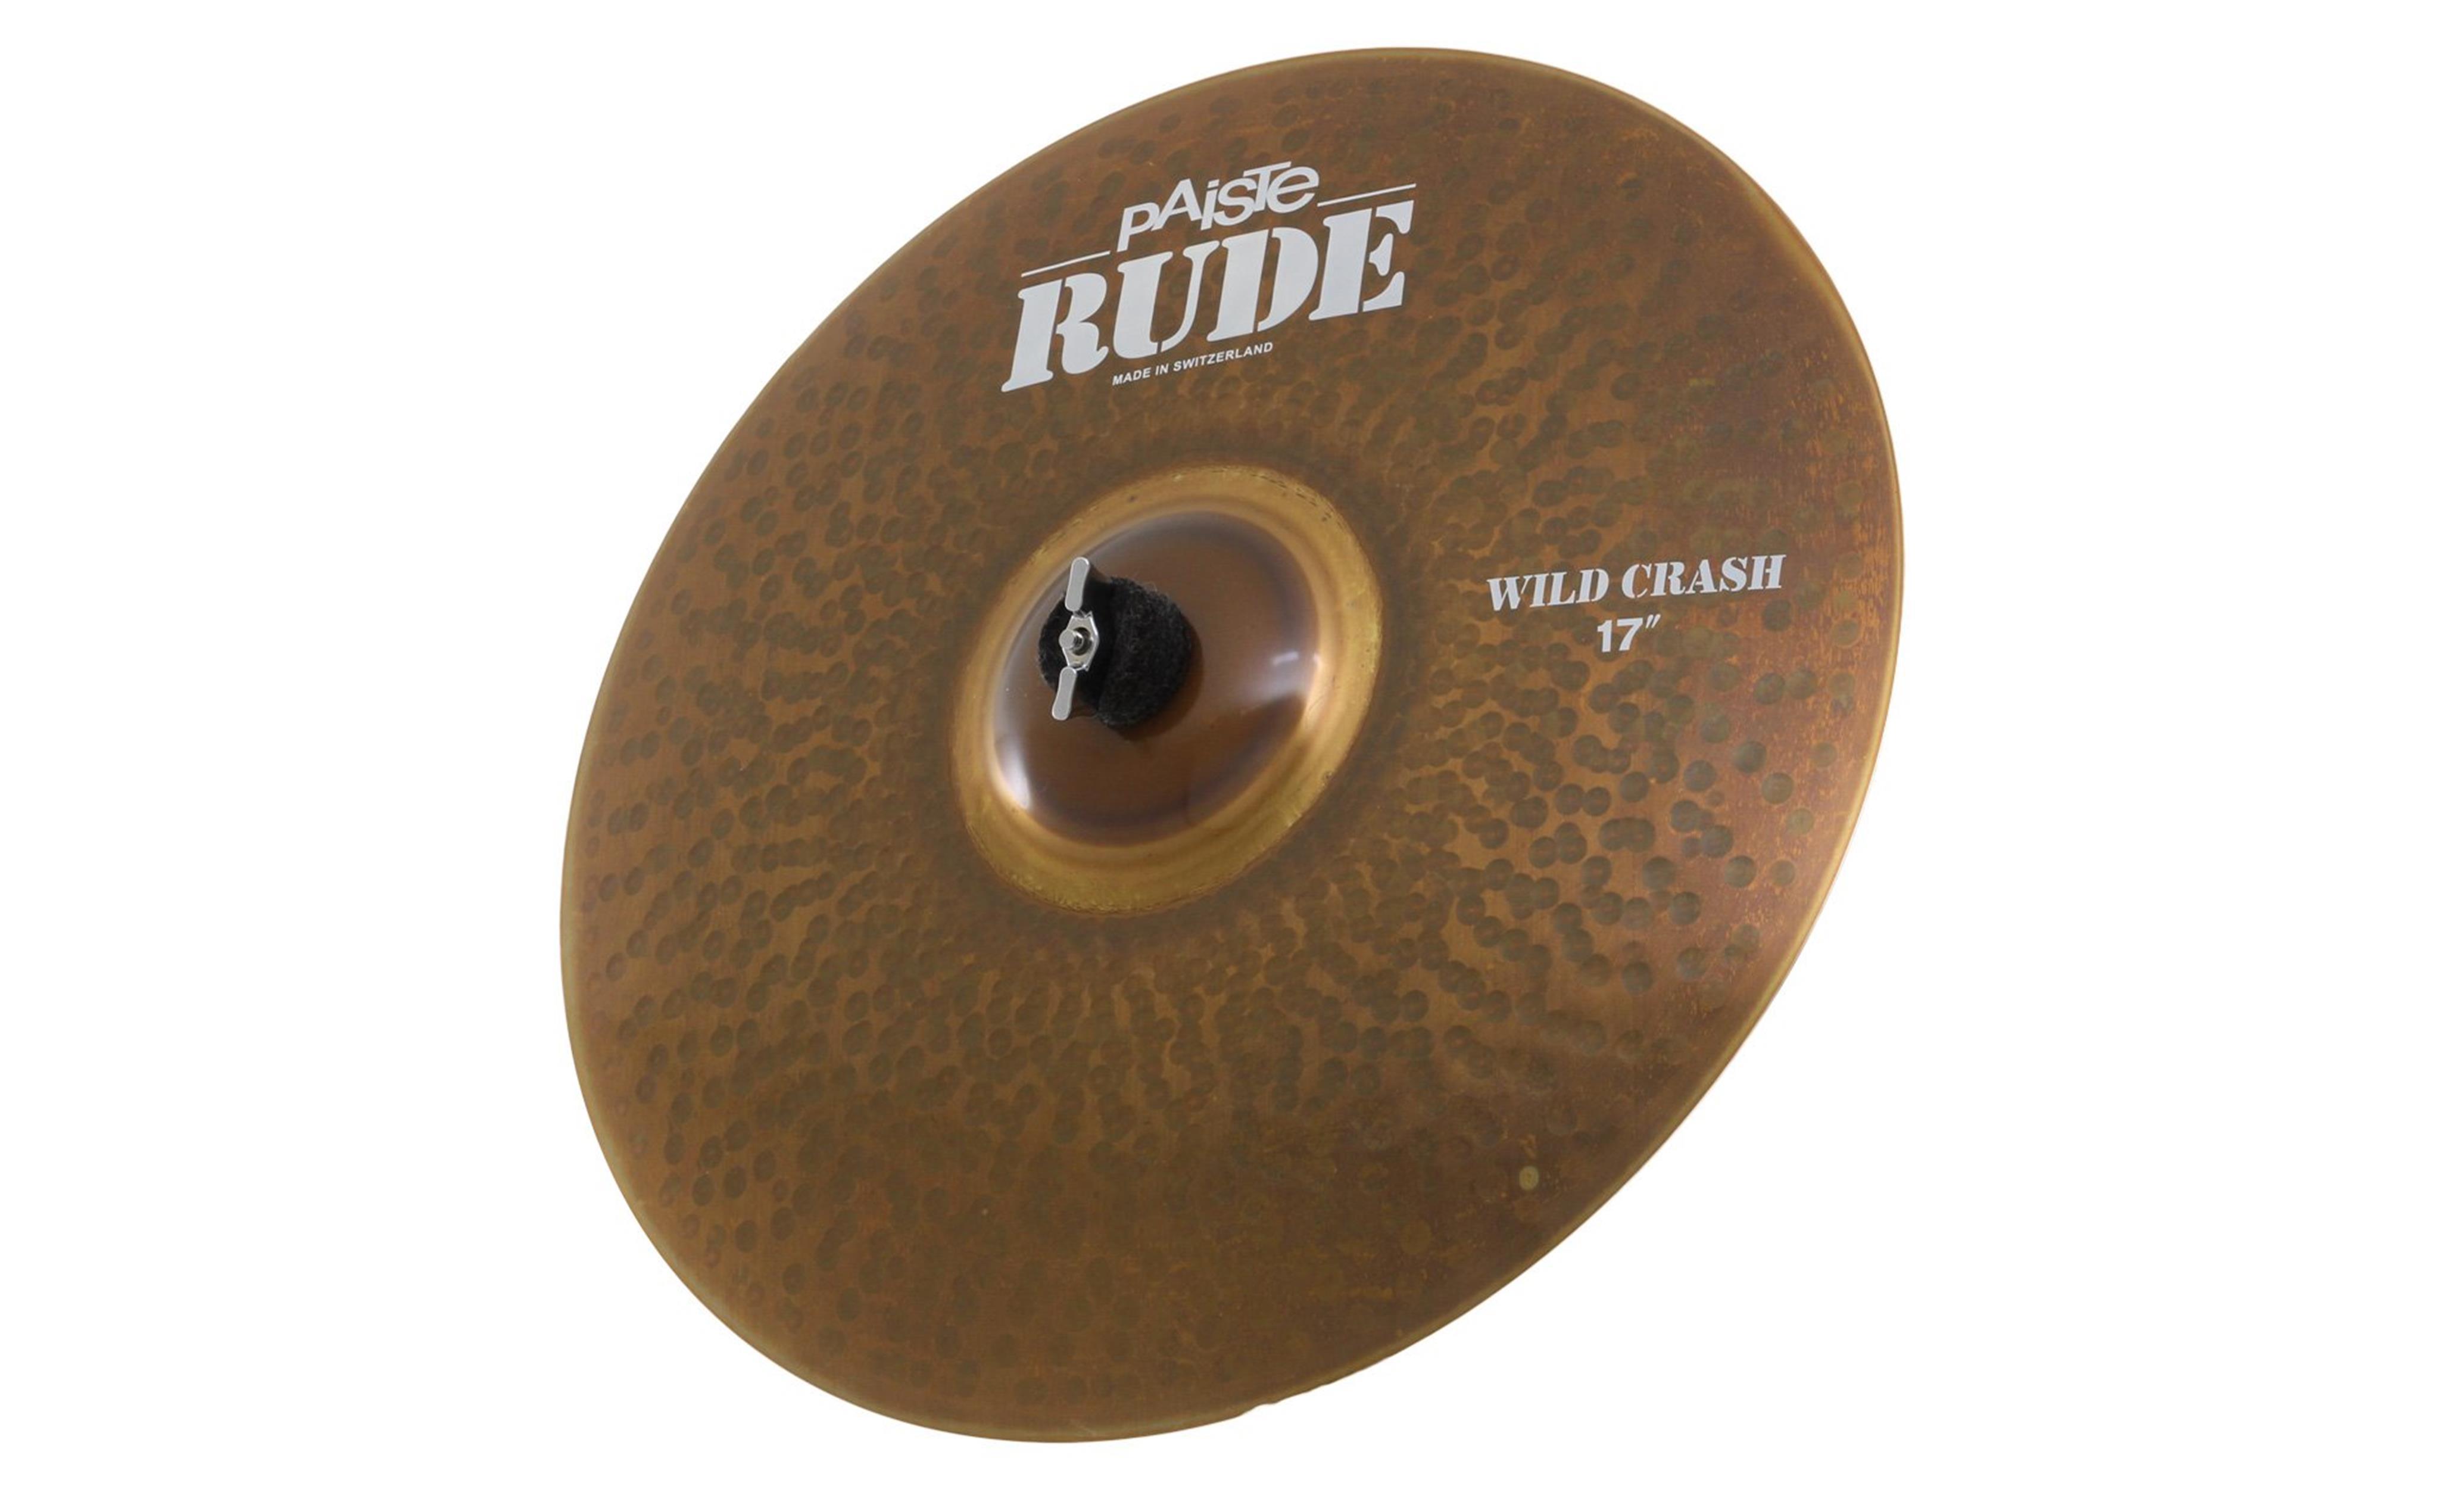 PAISTE-RCCWC17-RUDE-CLASSIC-WILD-CRASH-17-sku-12352